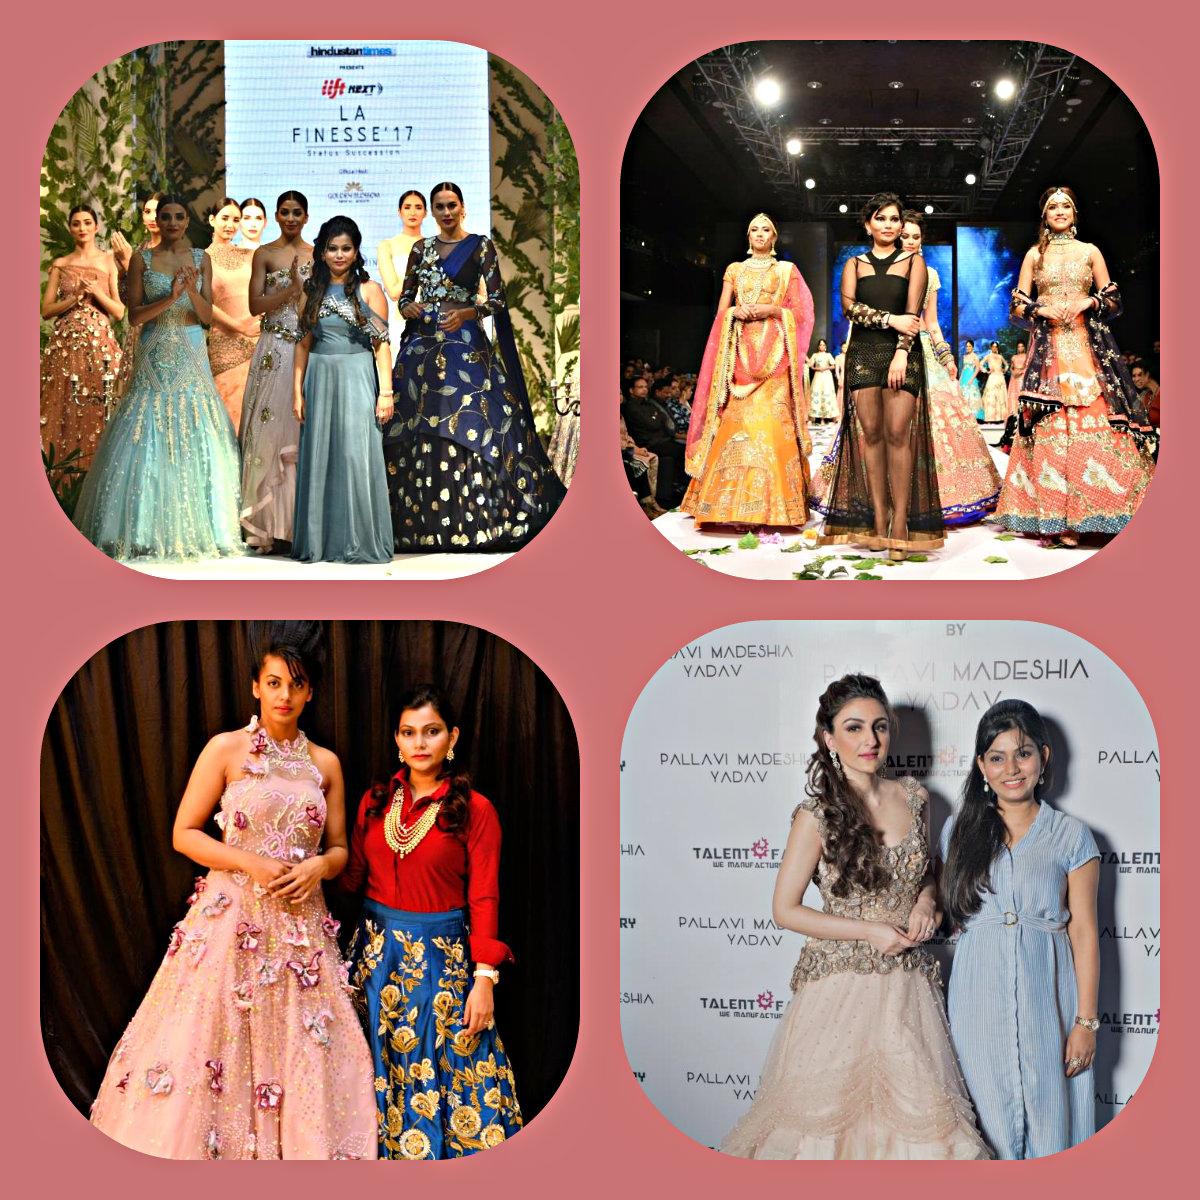 Be Original Be Creative Is Kff S Designer Pallavi S Mantra To Success